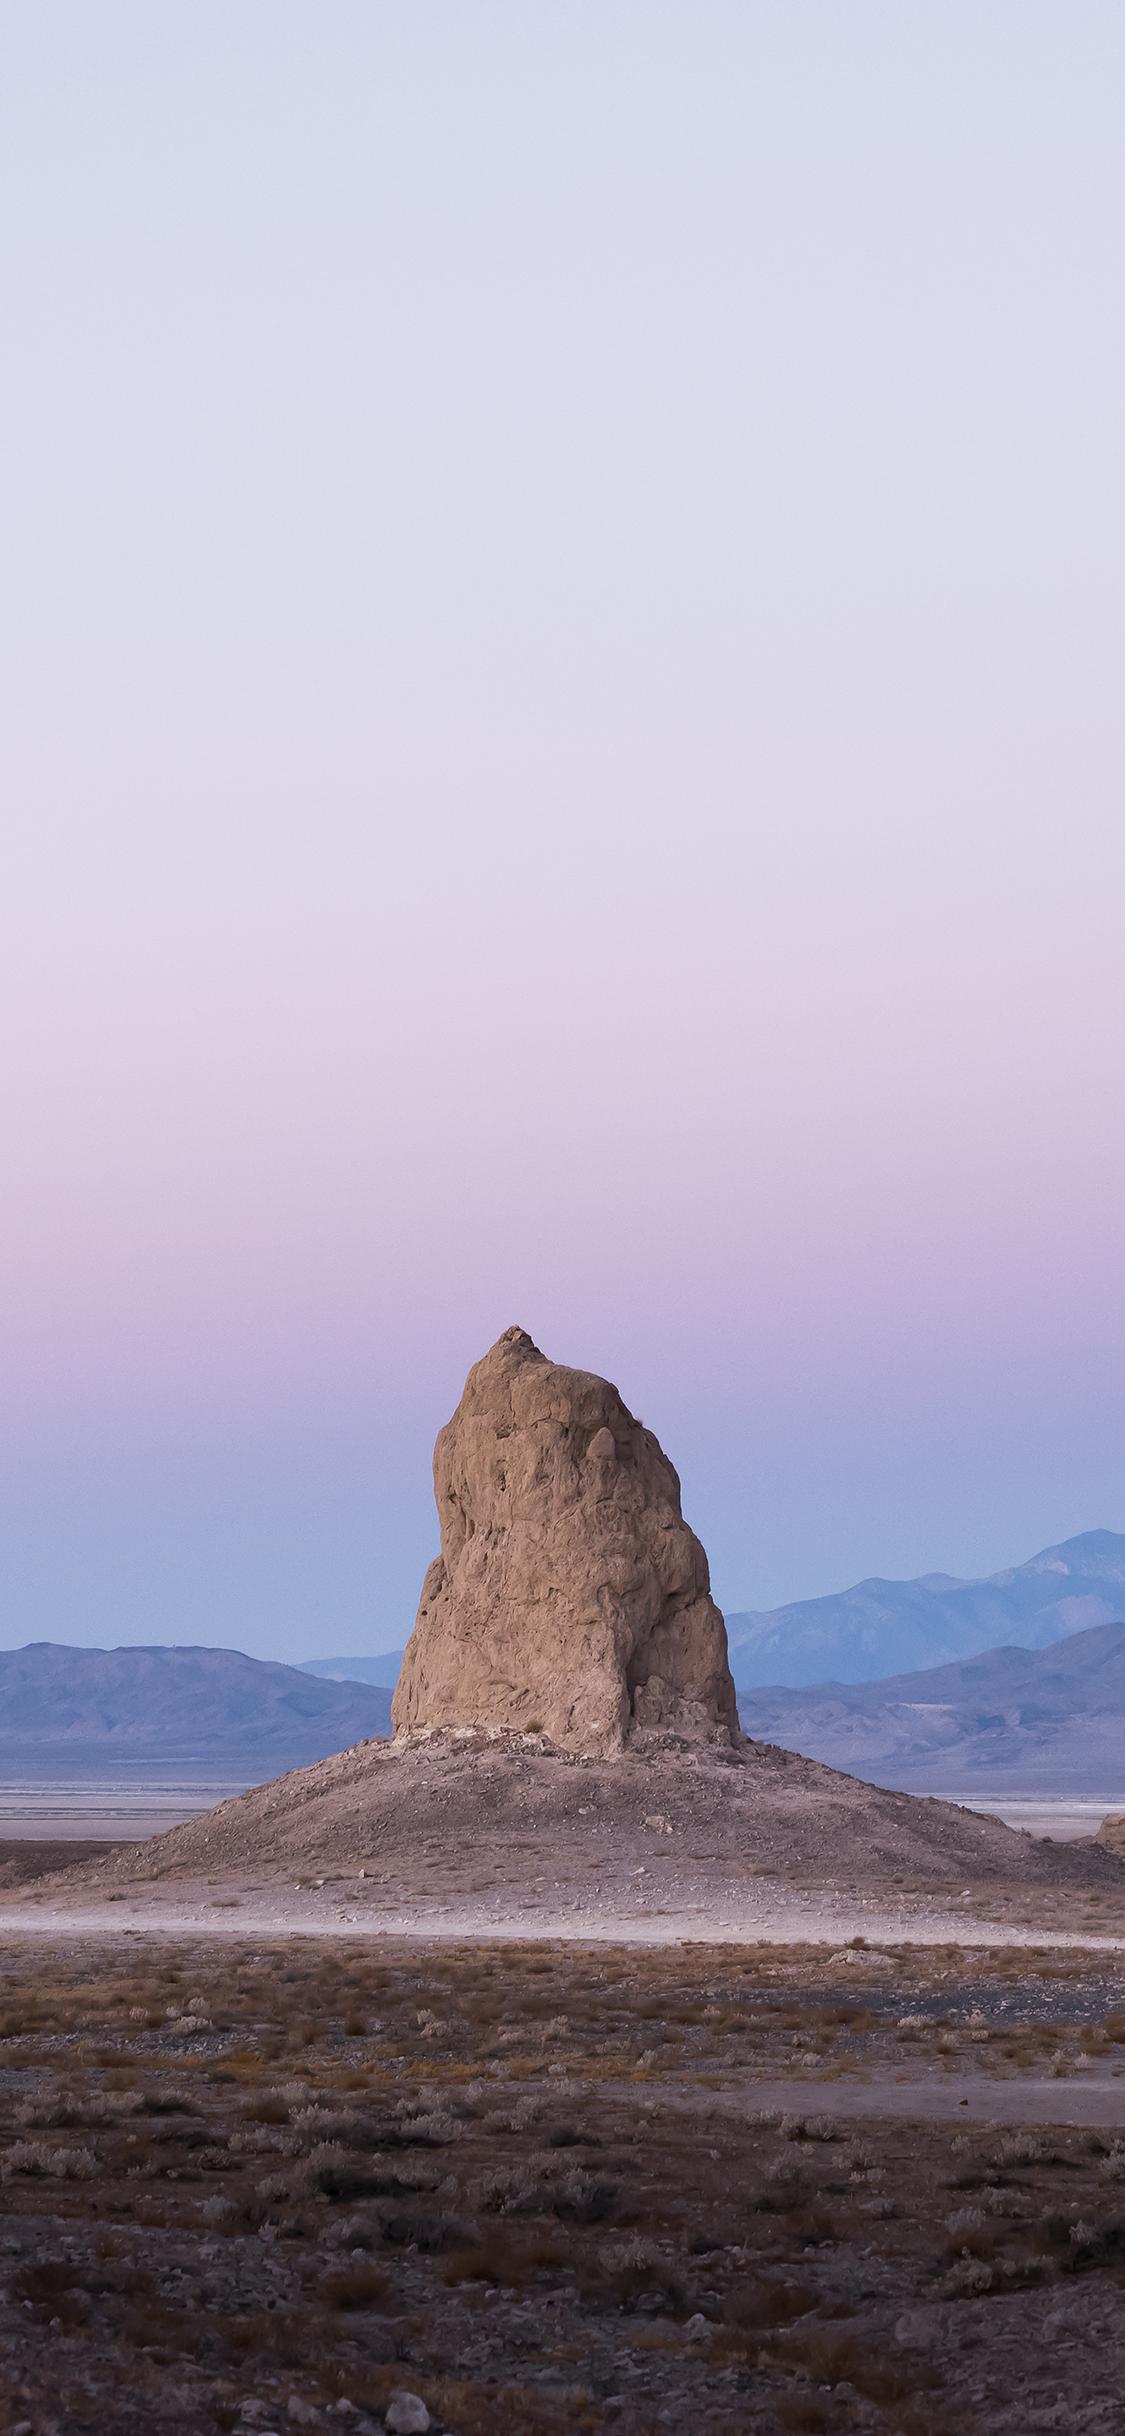 Mojave hintergrund ipad